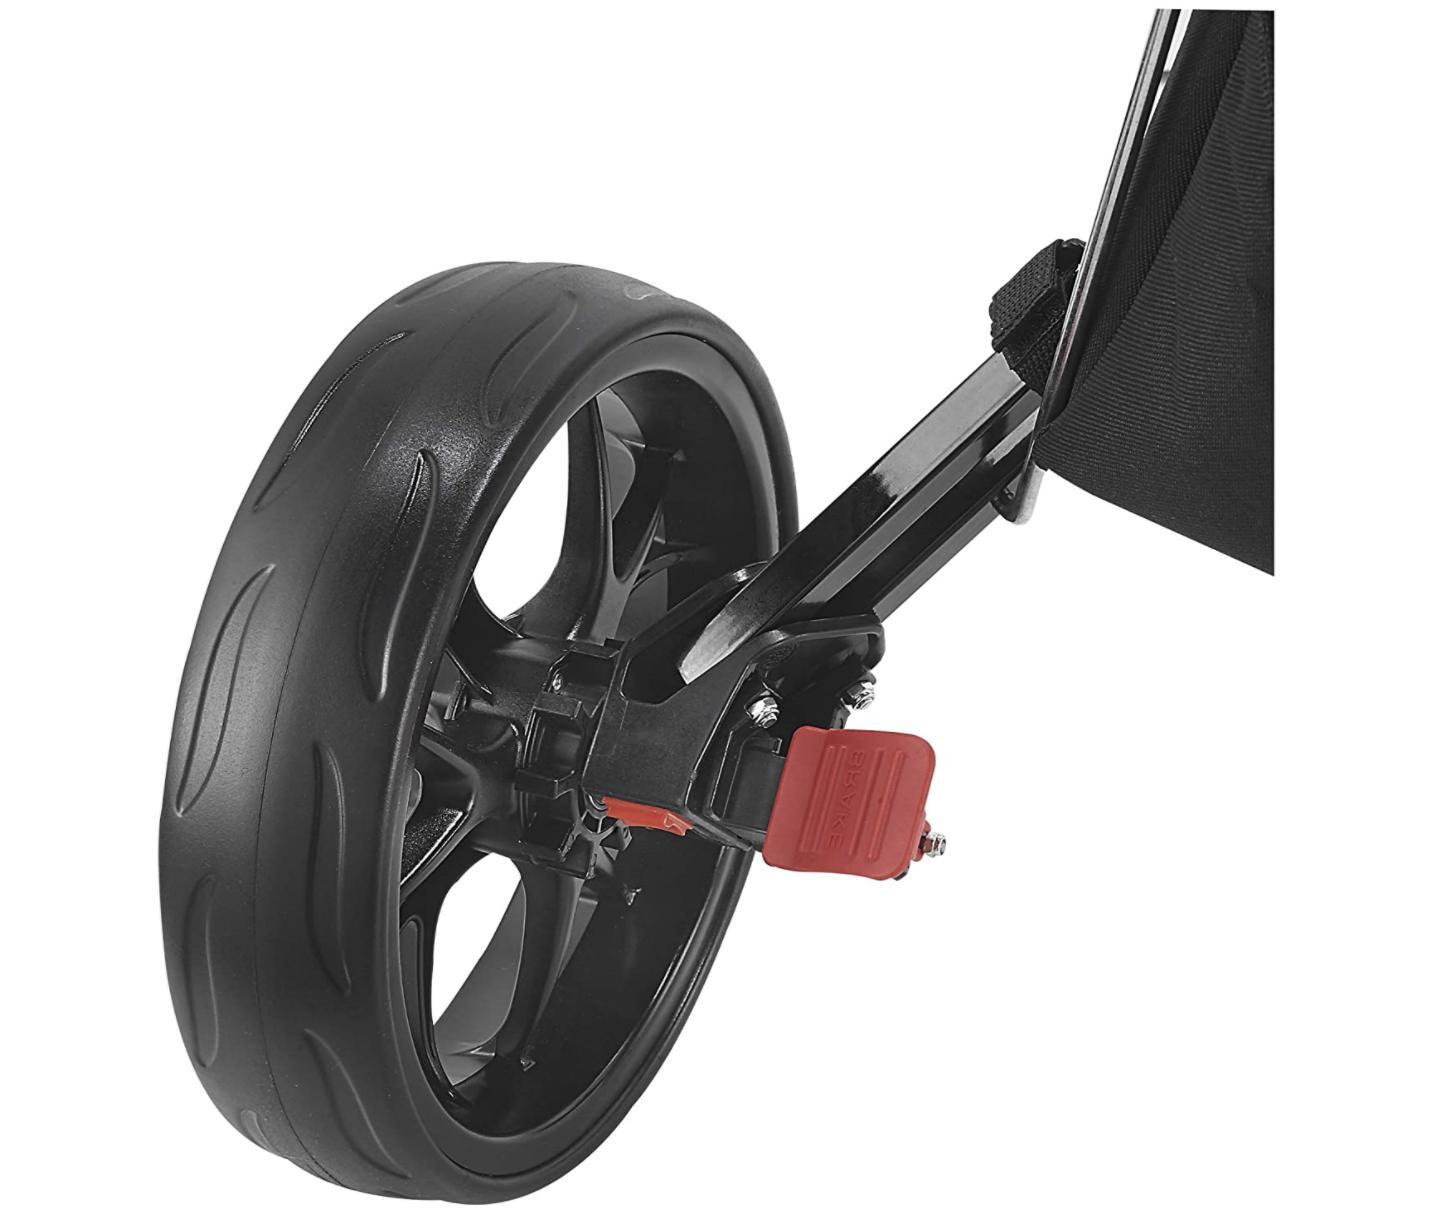 New CaddyTek Wheel Push Cart Version 3, CaddyLite V3 in